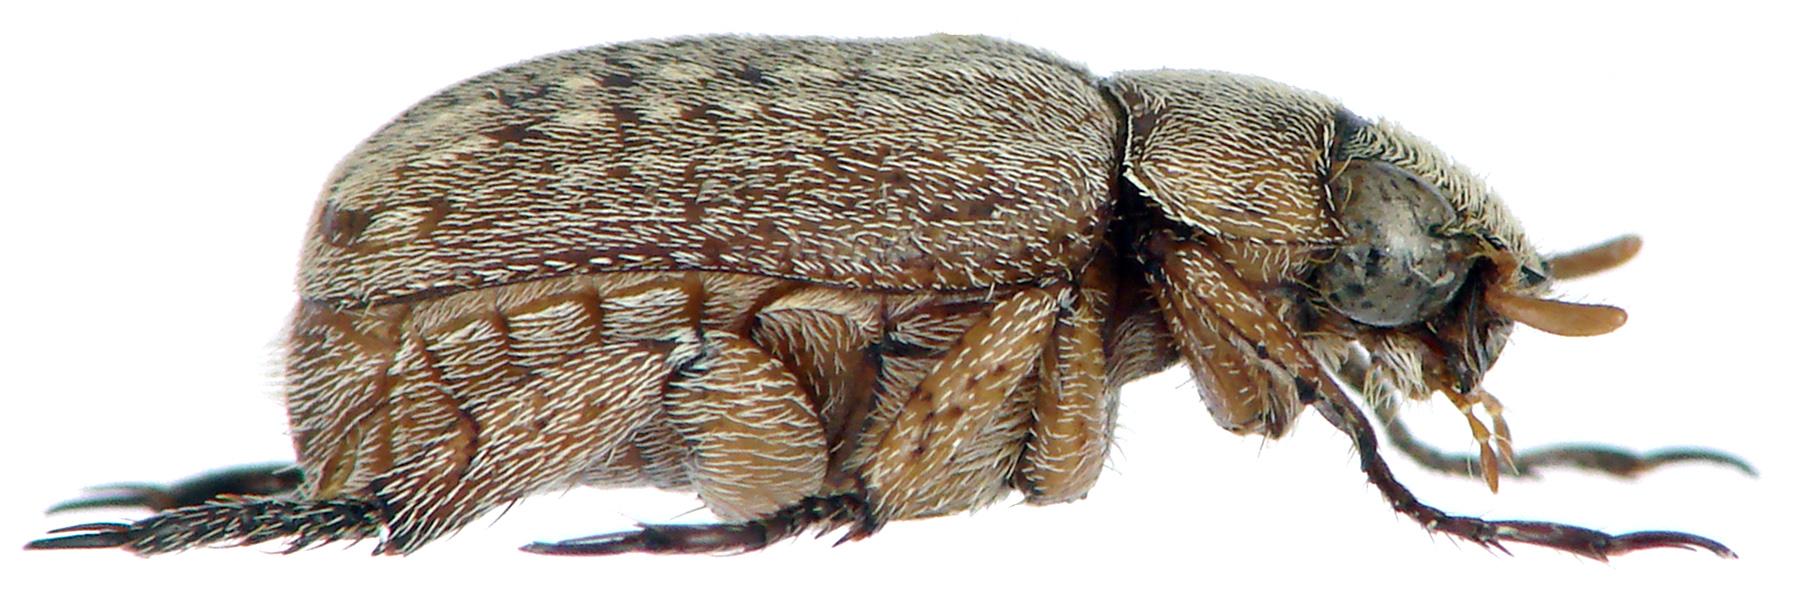 Adoretus paulyi holotype Male Lateral.jpg